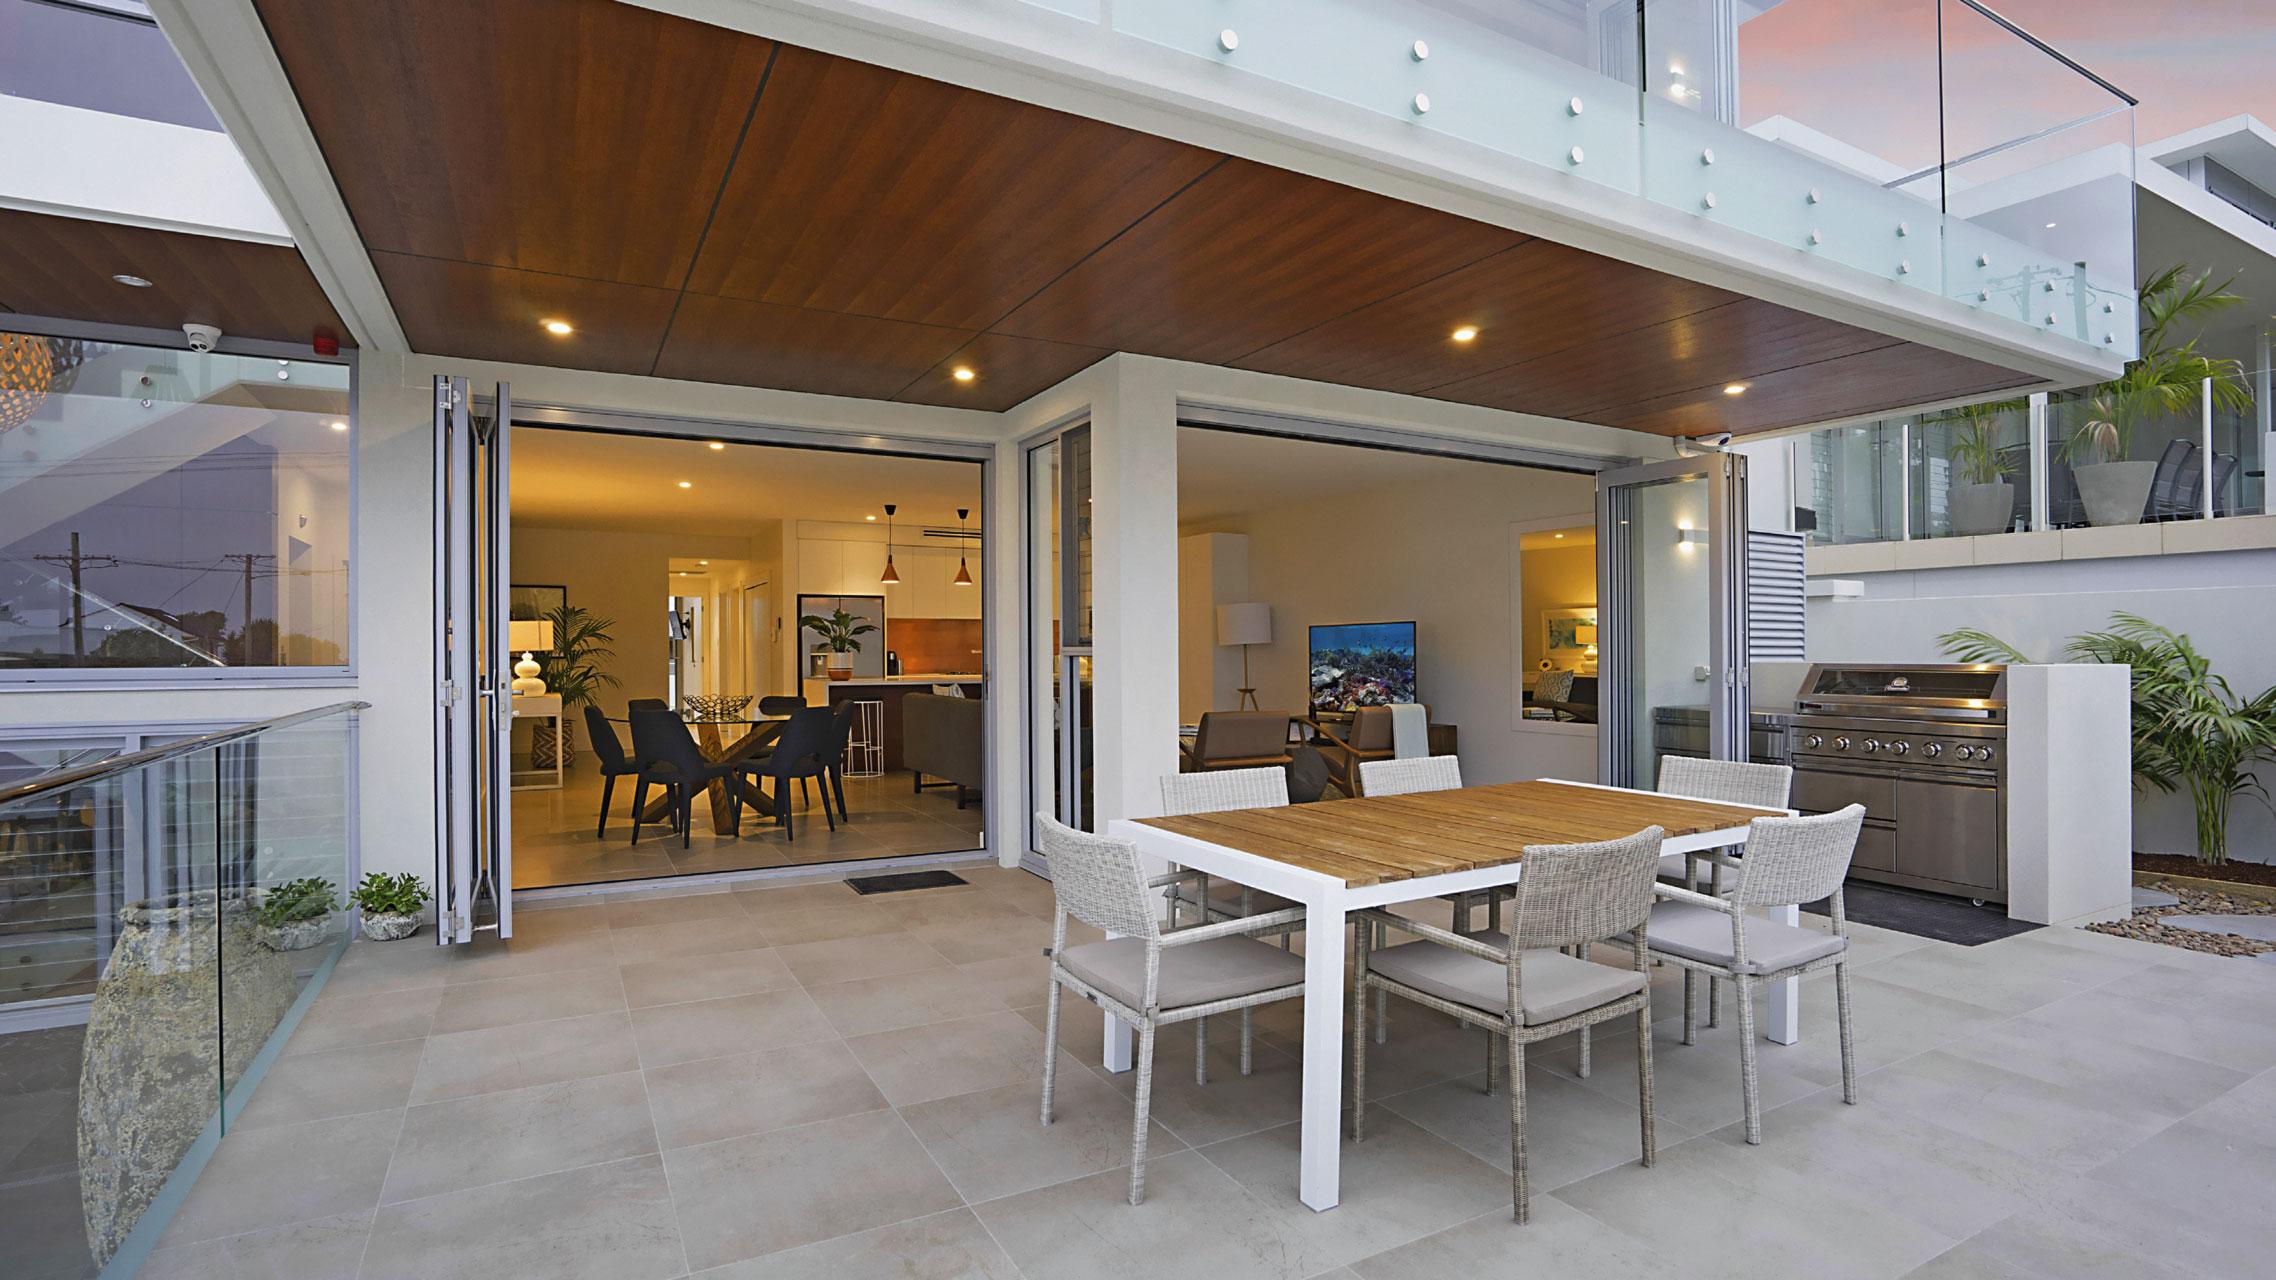 Ultra Silver Bifold Doors opening to a courtyard